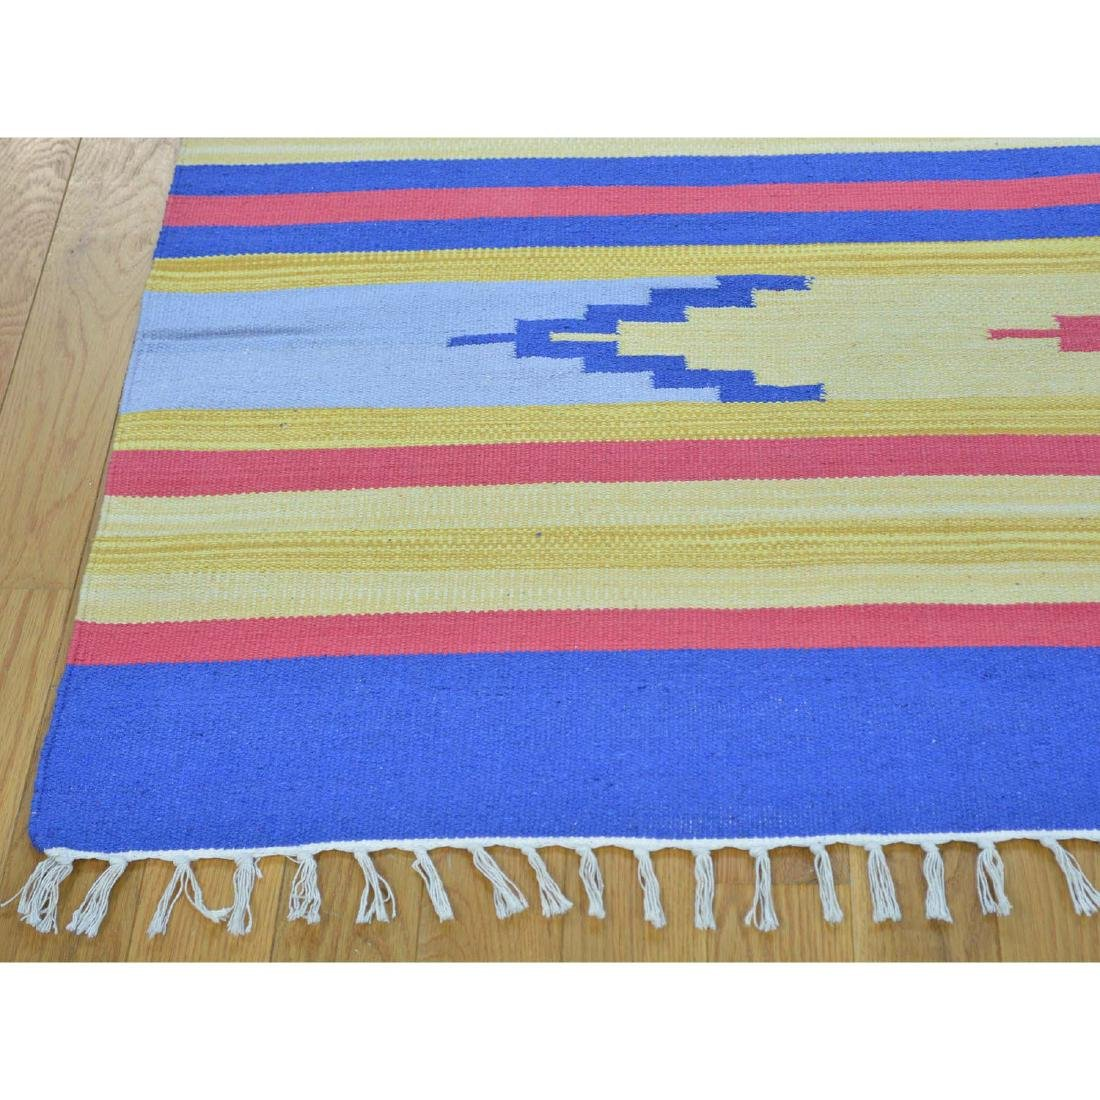 Square Navajo Design Flat Weave Hand Woven Killim Rug - 3